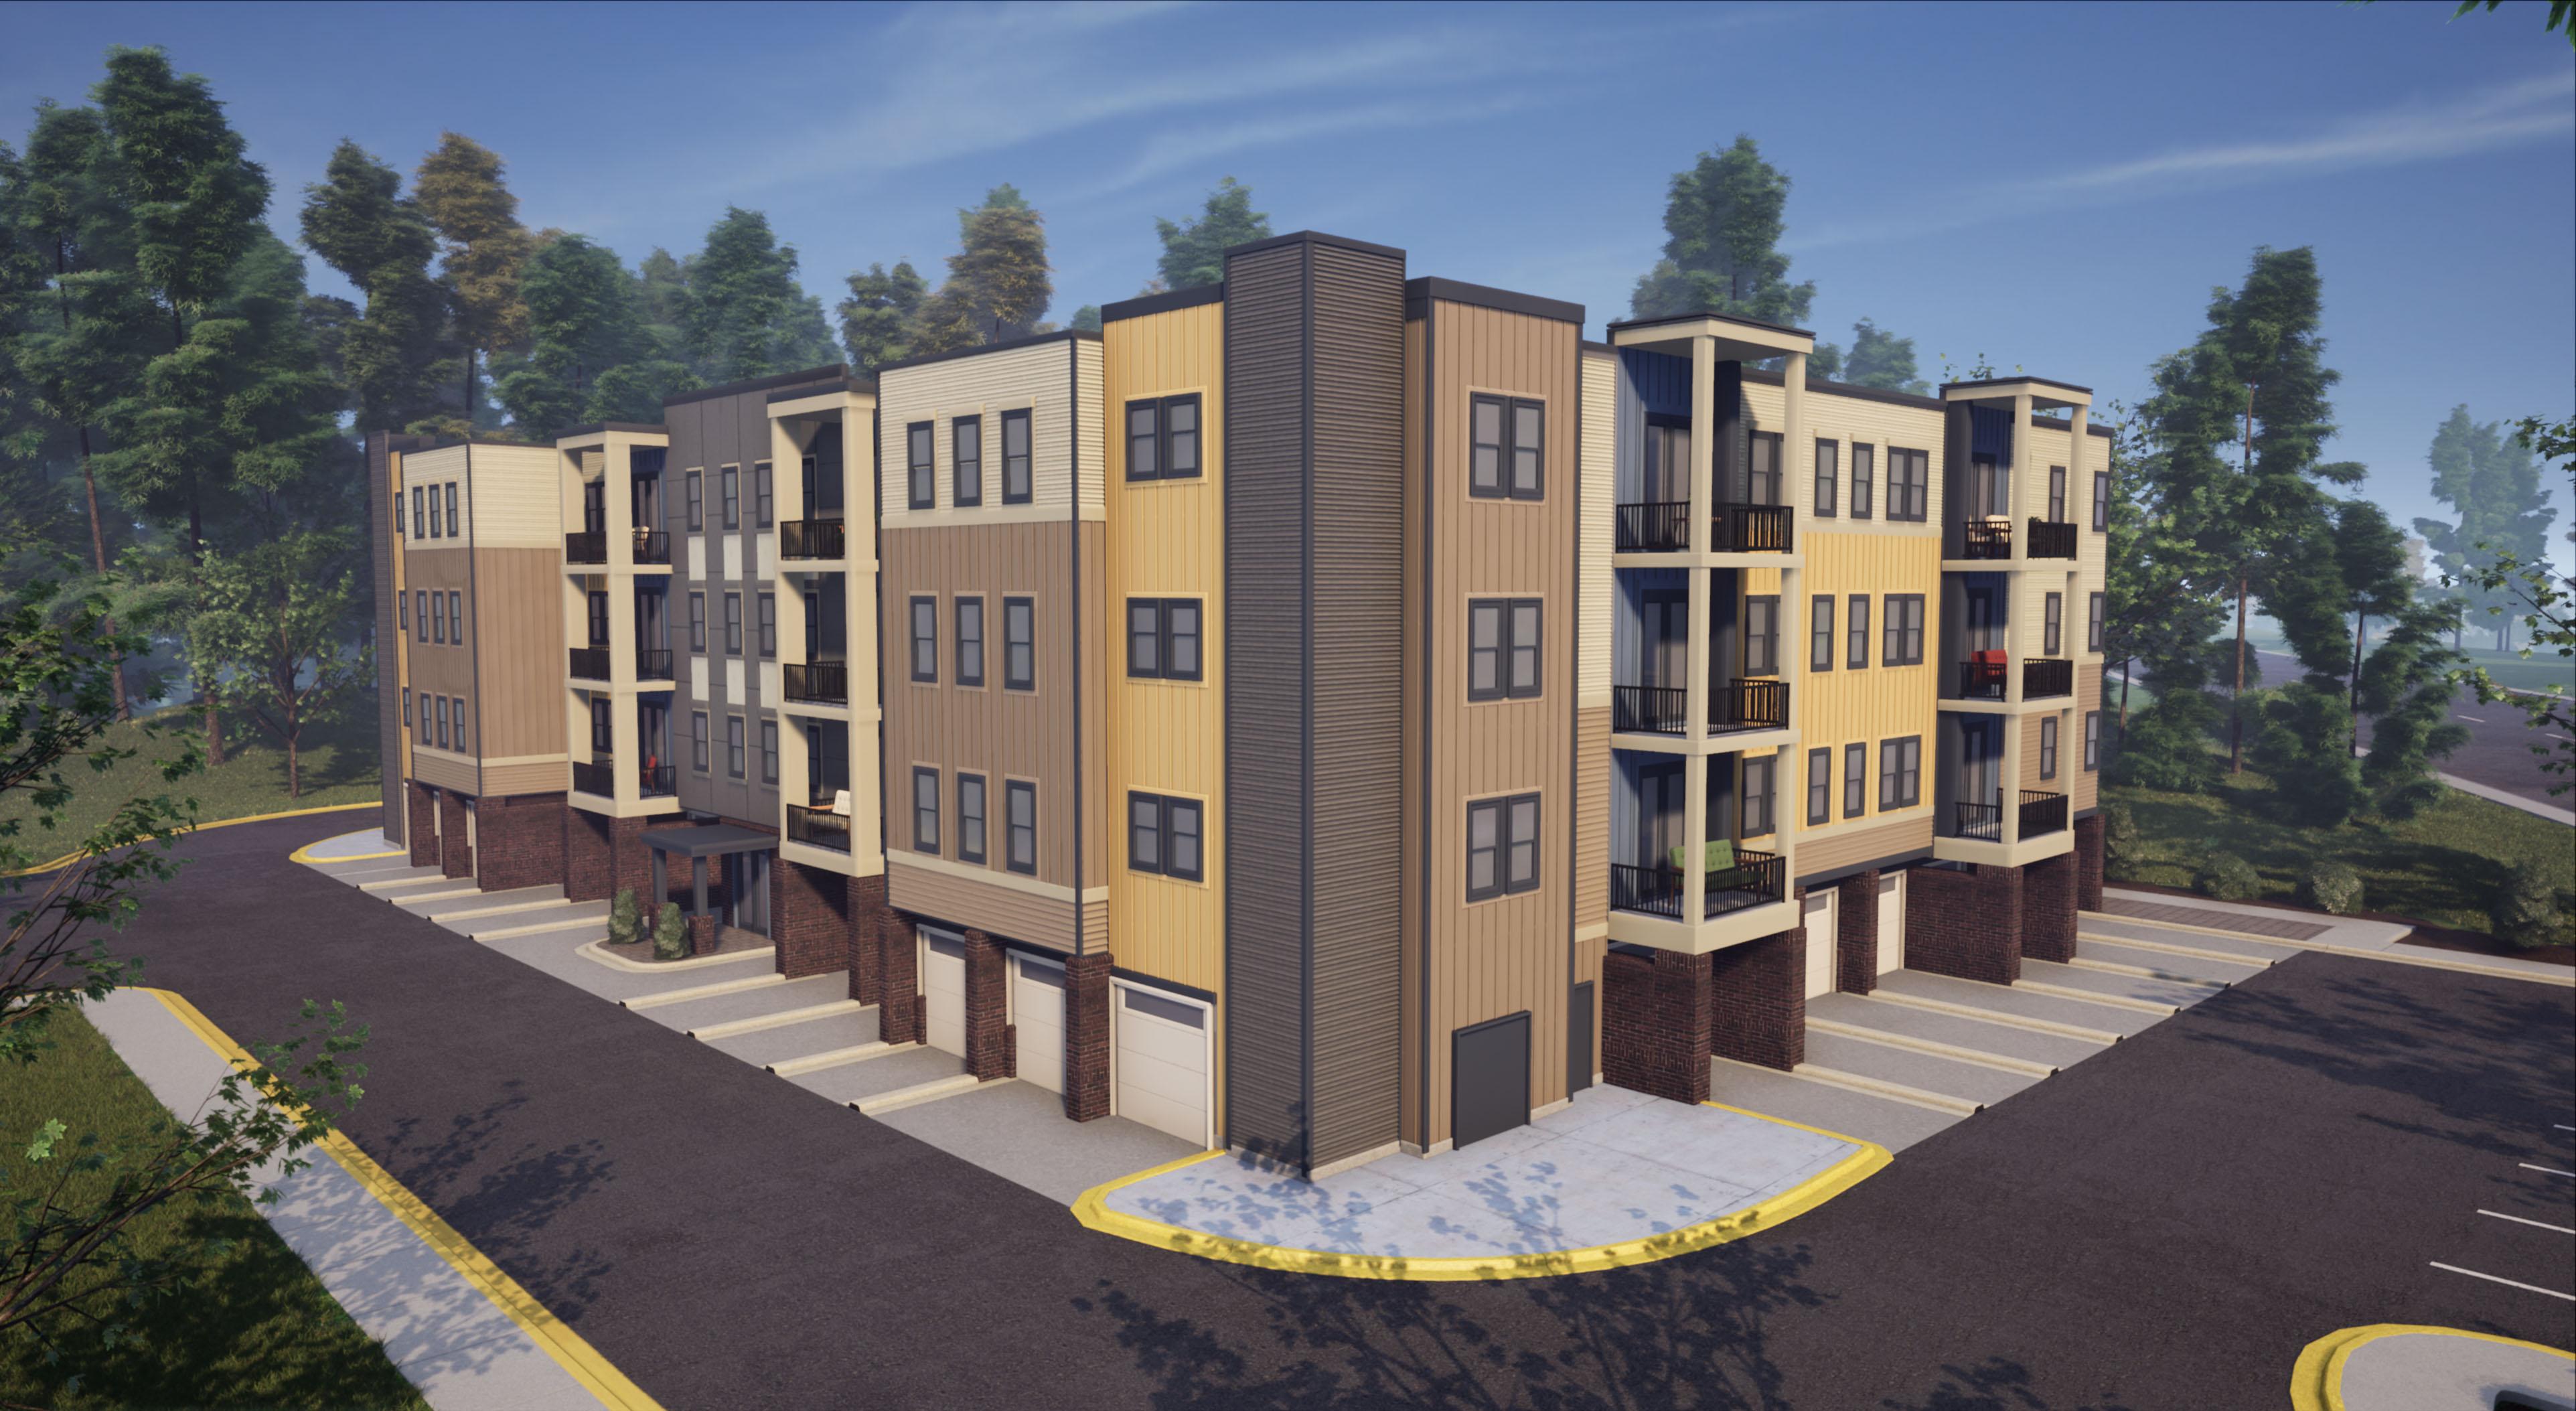 Condominium for Sale at The Signature - Van Metre Homes-Building 1 - The Verdana 43045 Van Metre Drive, Suite 175 Ashburn, Virginia 20148 United States